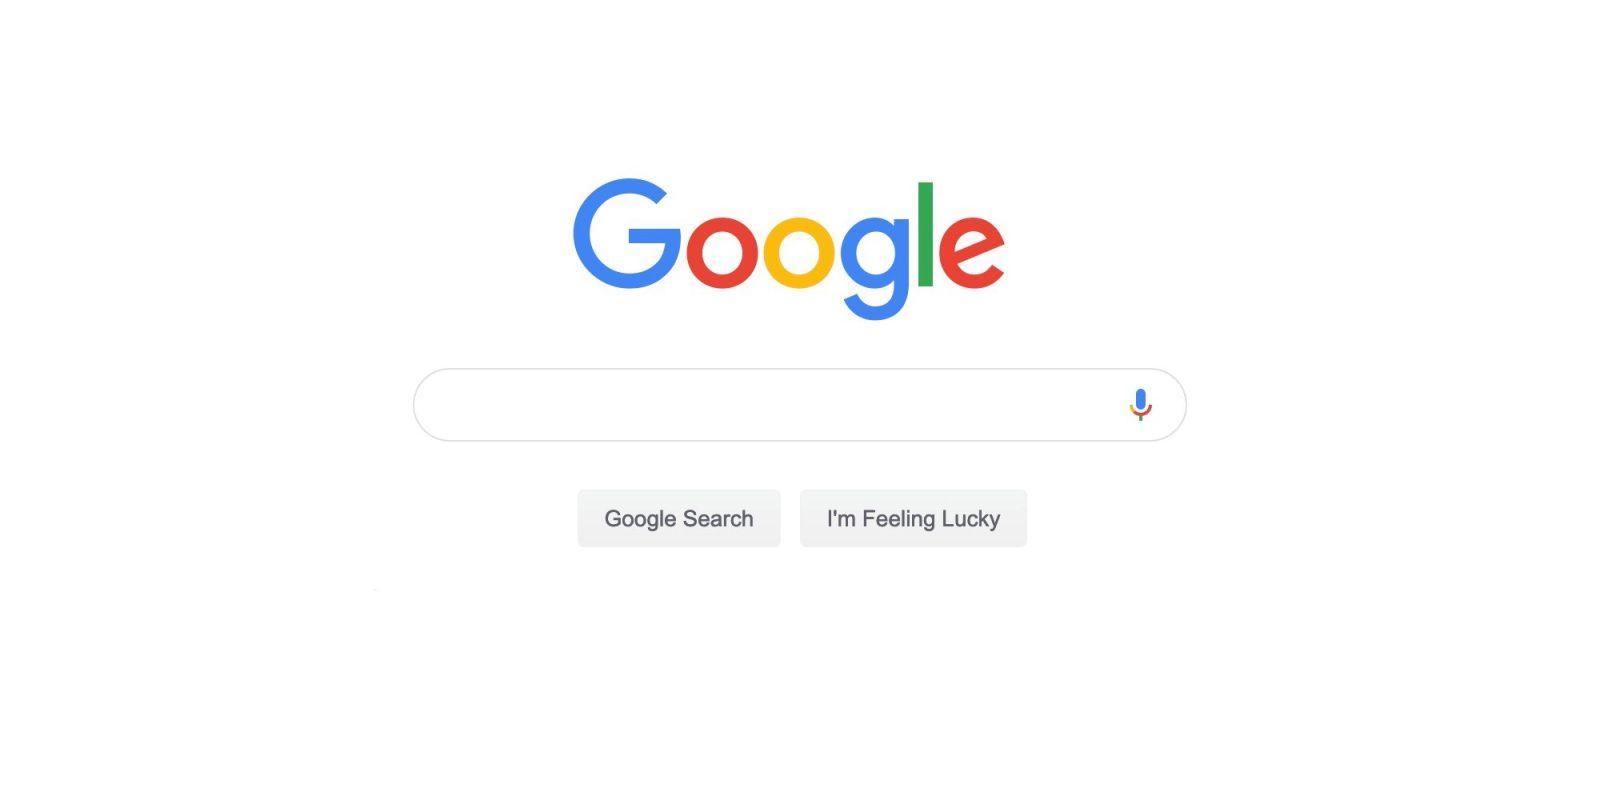 Google Search Engine Image